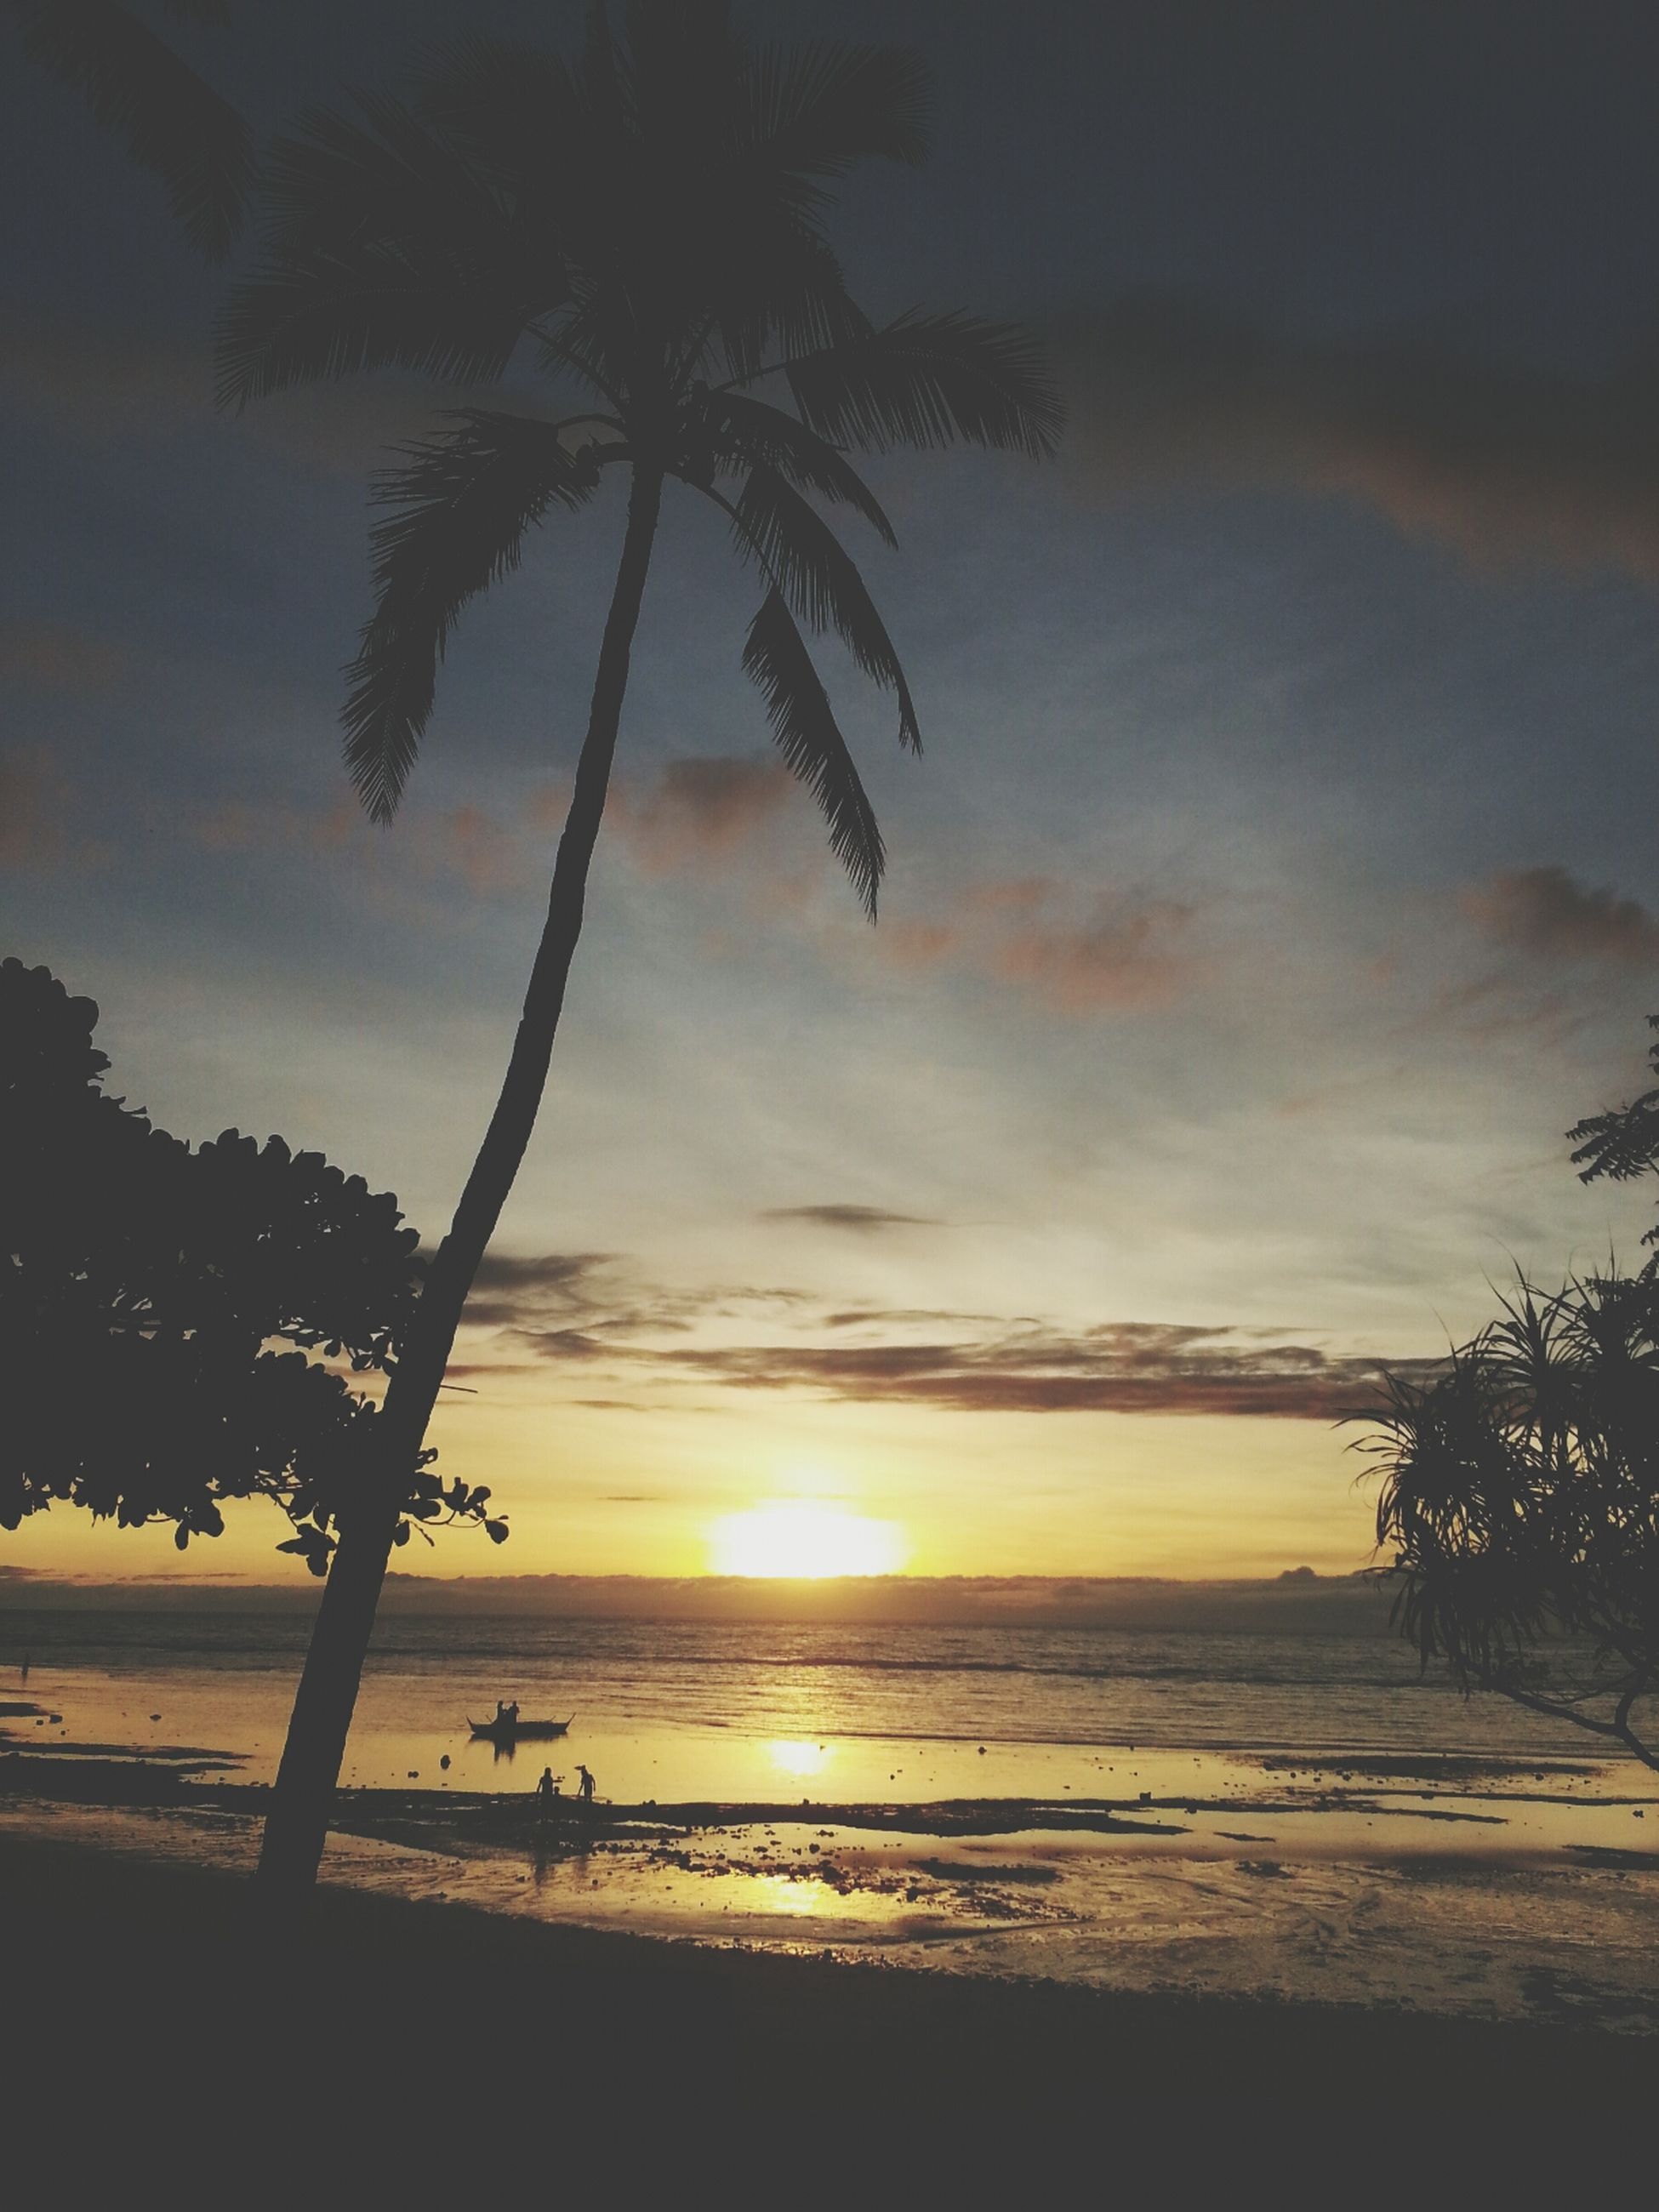 sunset, sea, beach, horizon over water, tranquil scene, scenics, tranquility, sky, water, beauty in nature, silhouette, shore, tree, sun, nature, idyllic, palm tree, cloud - sky, sand, sunlight